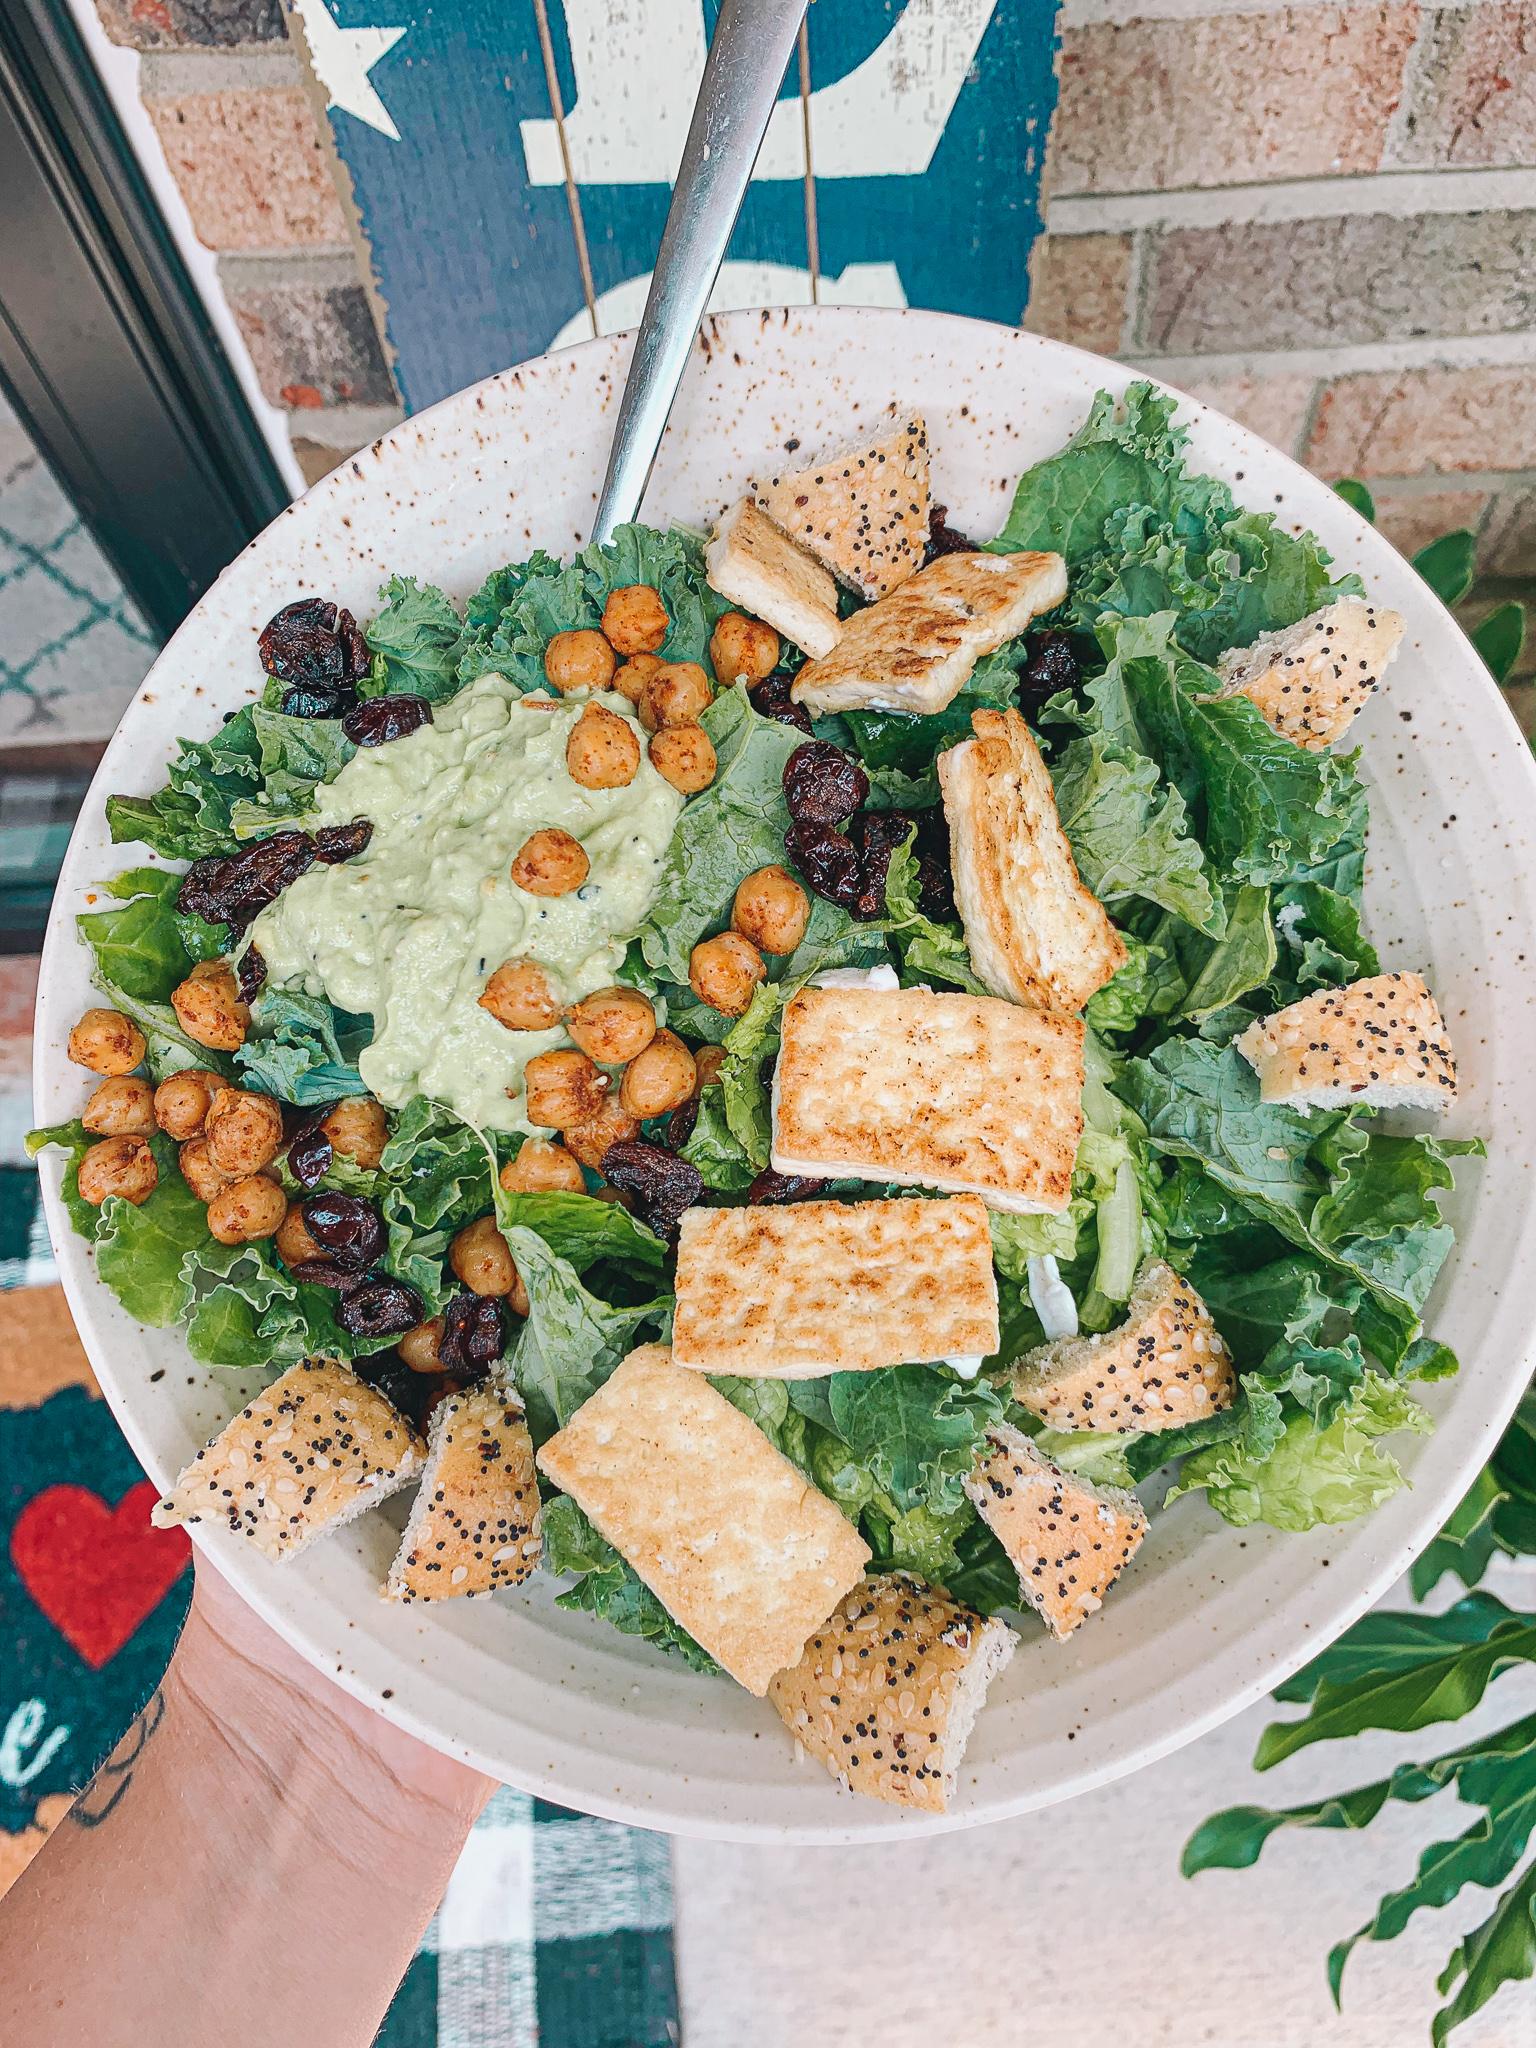 vegan food, salad, kale, homemade dressing, avocado, veganaise, chickpeas, dinner, gluten free, dairy free, low Calorie, low carb, summer eats, recap blog, healthy living lifestyle